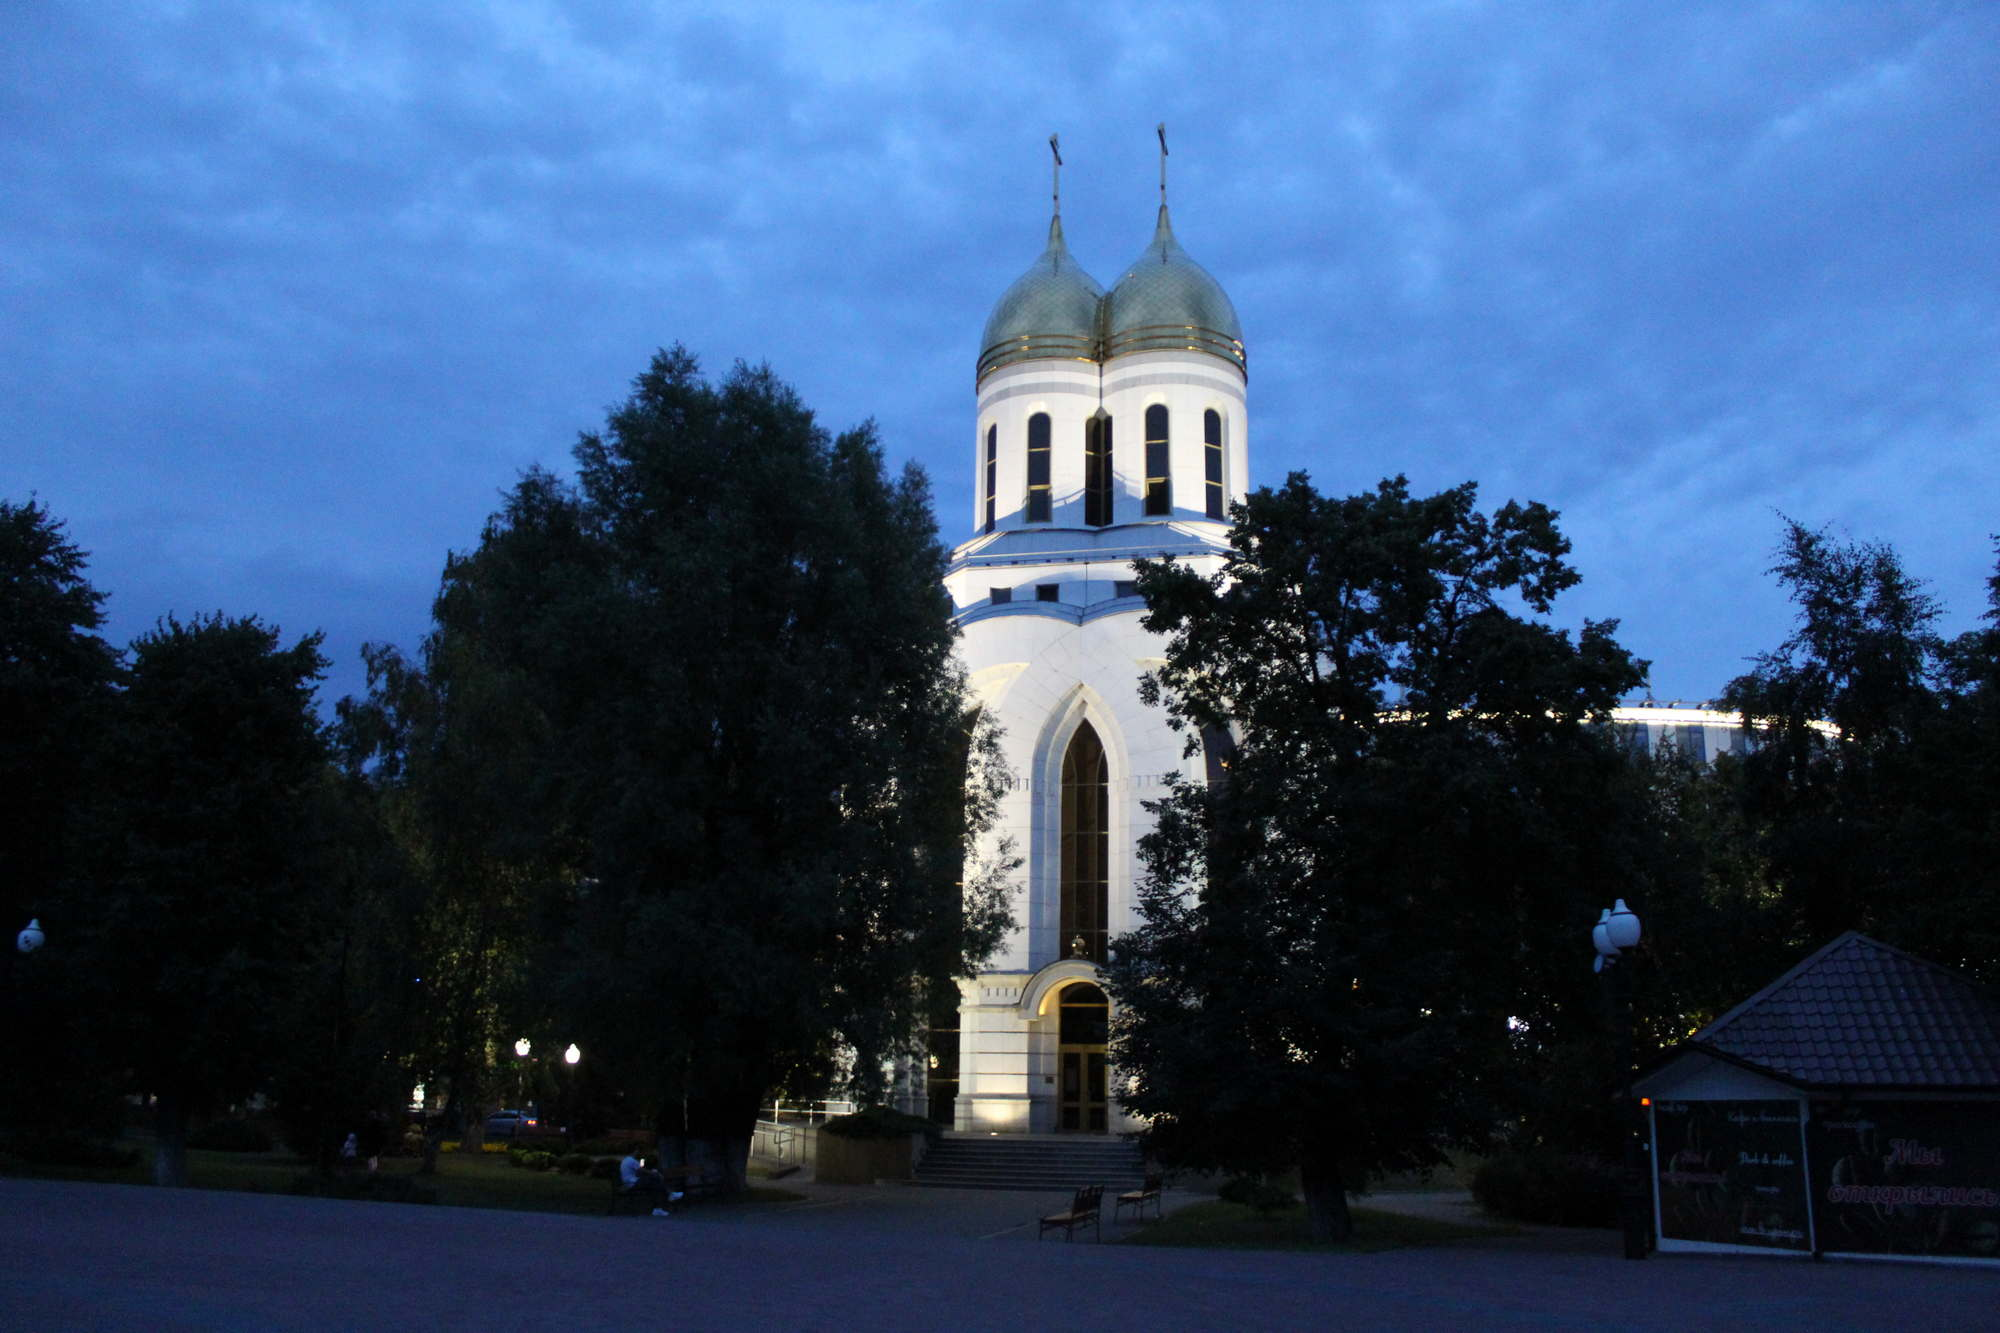 Часовня Петра и Февронии в Калининграде